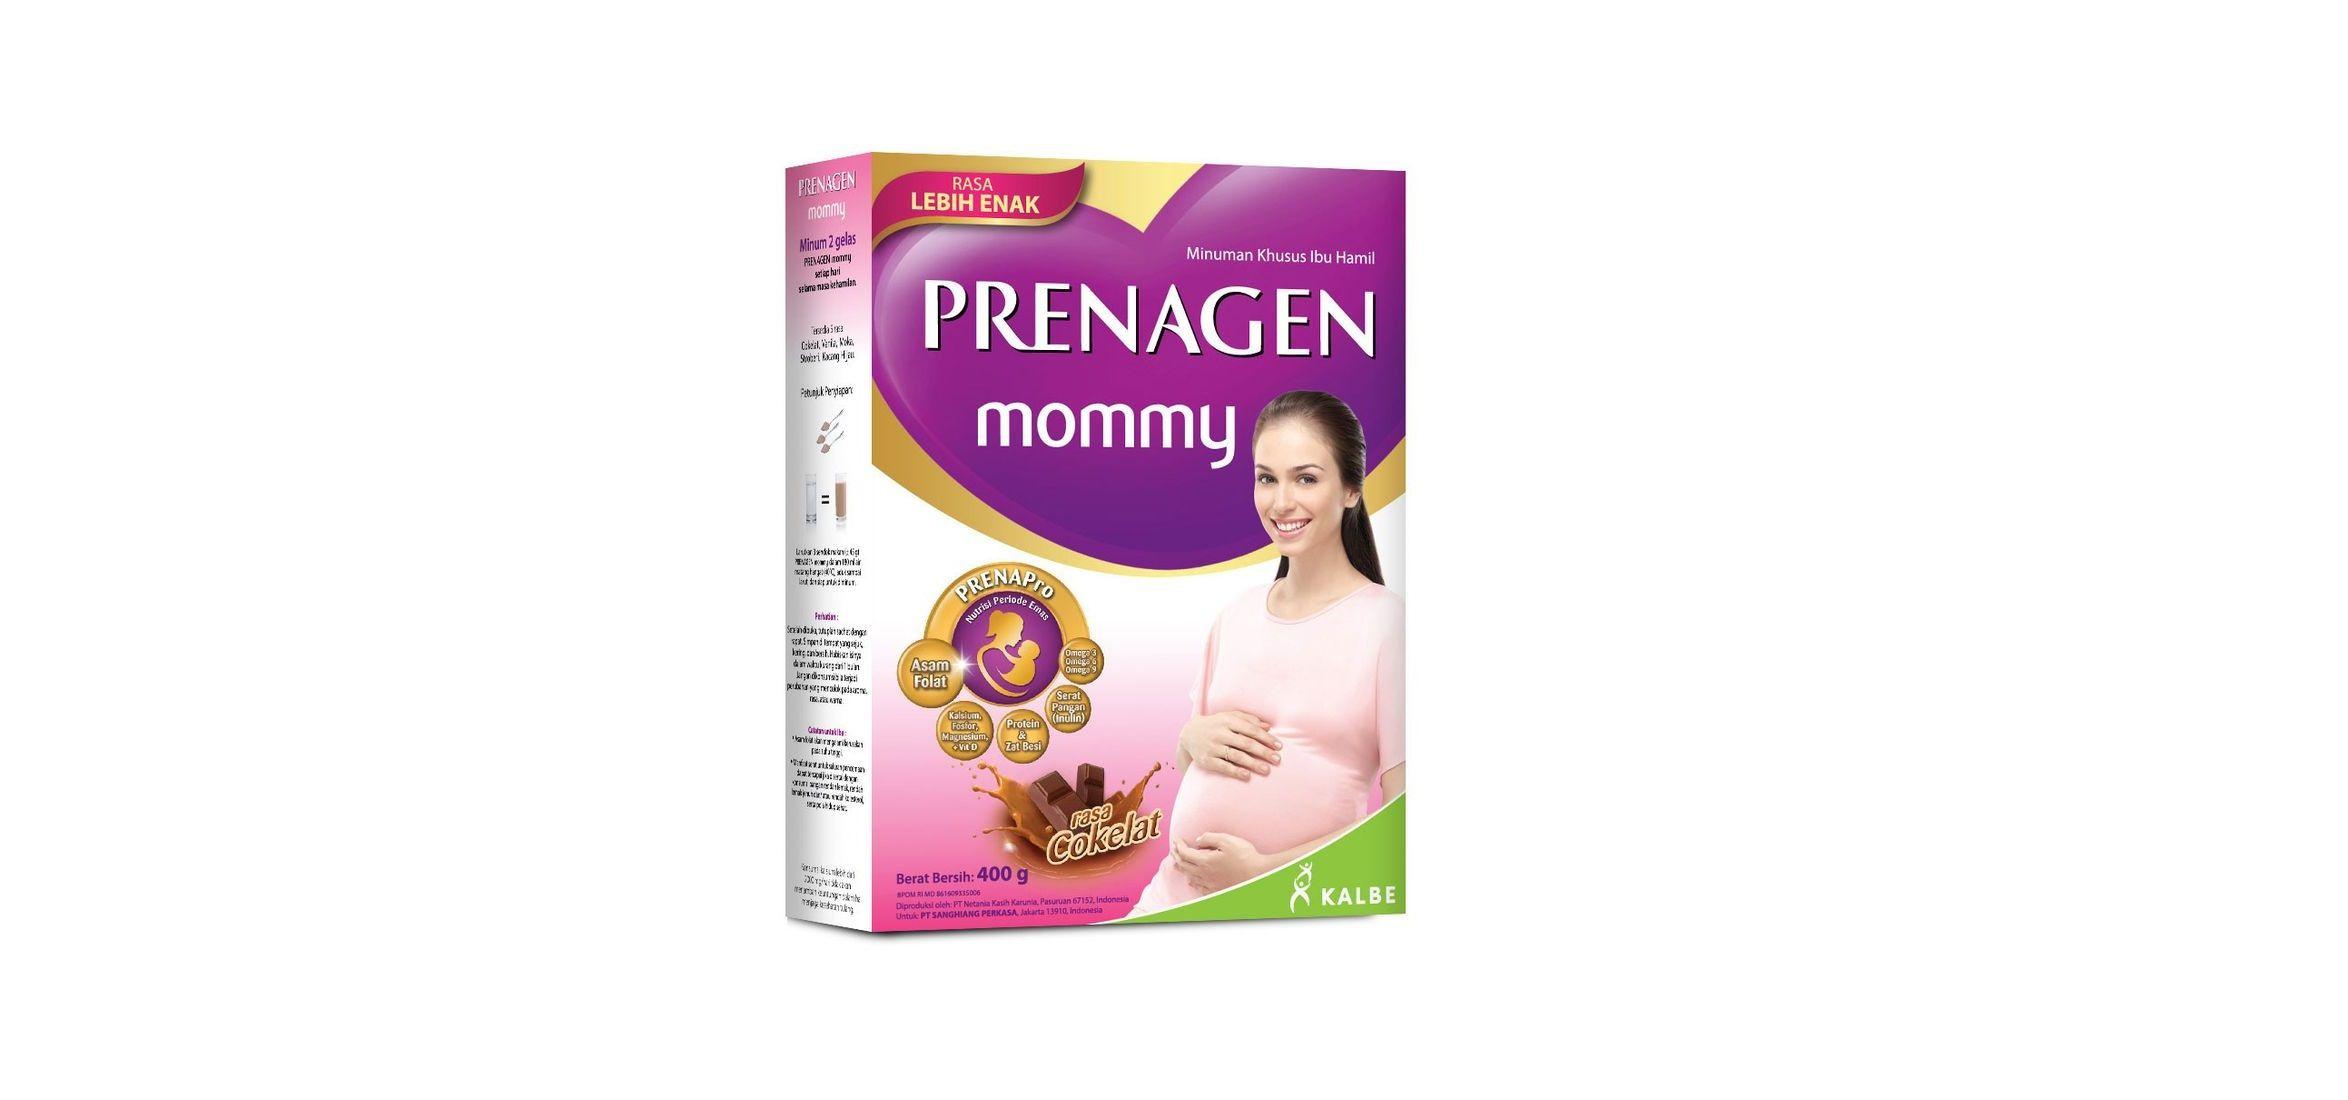 7. Prenagen Mommy menyediakan kandungan DHA kolin